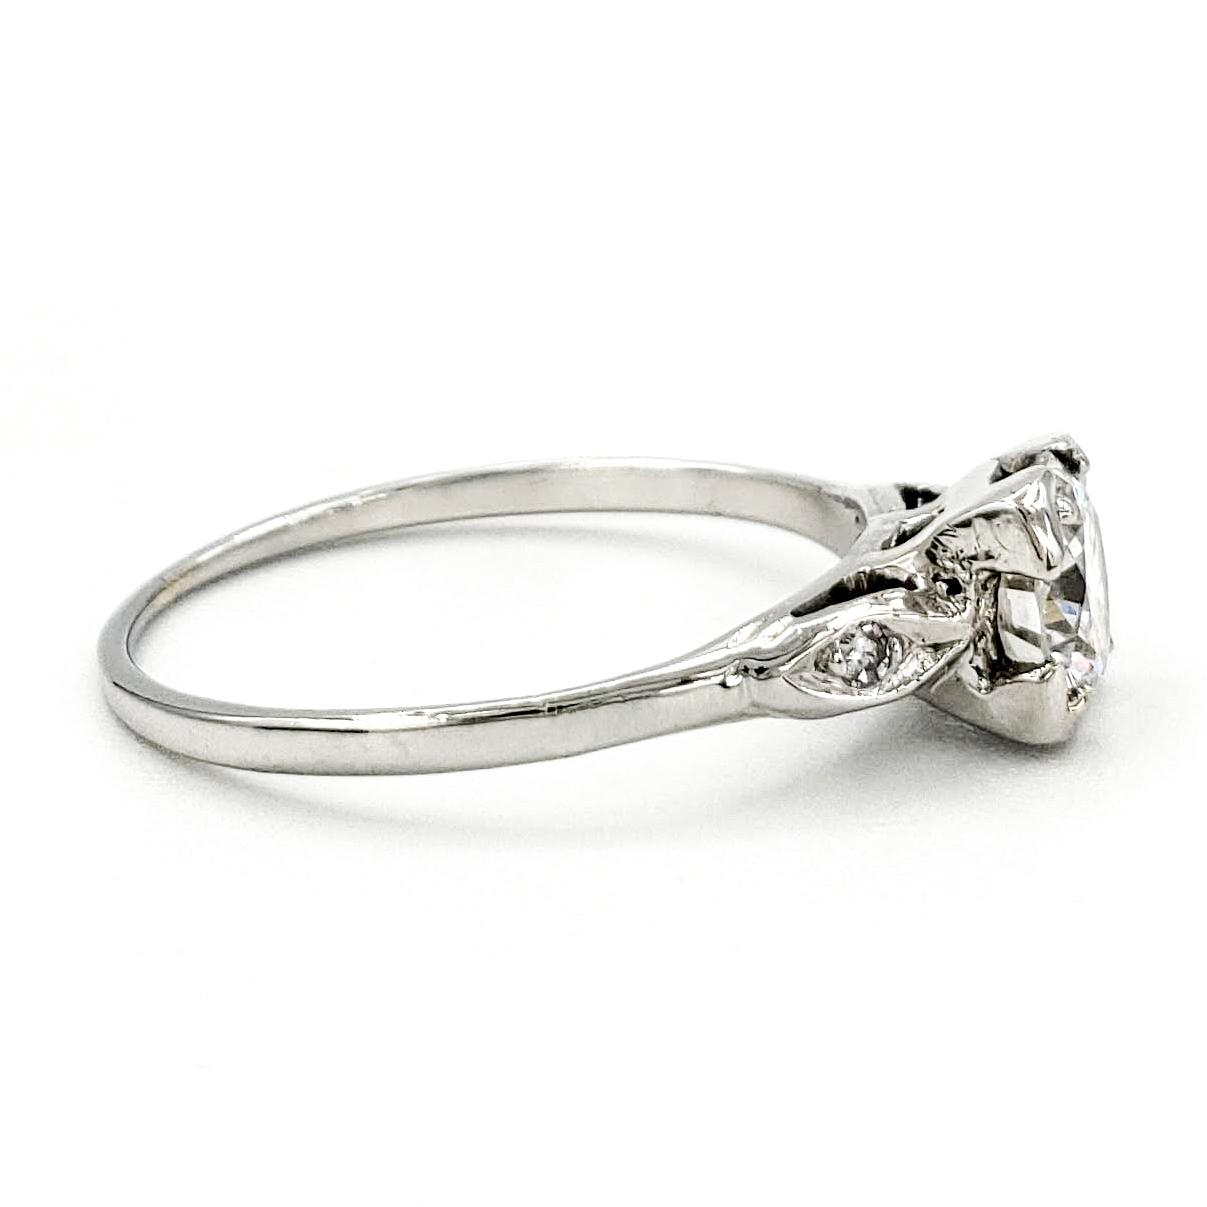 vintage-18-karat-gold-engagement-ring-with-0-58-carat-round-brilliant-cut-diamond-egl-f-vs2